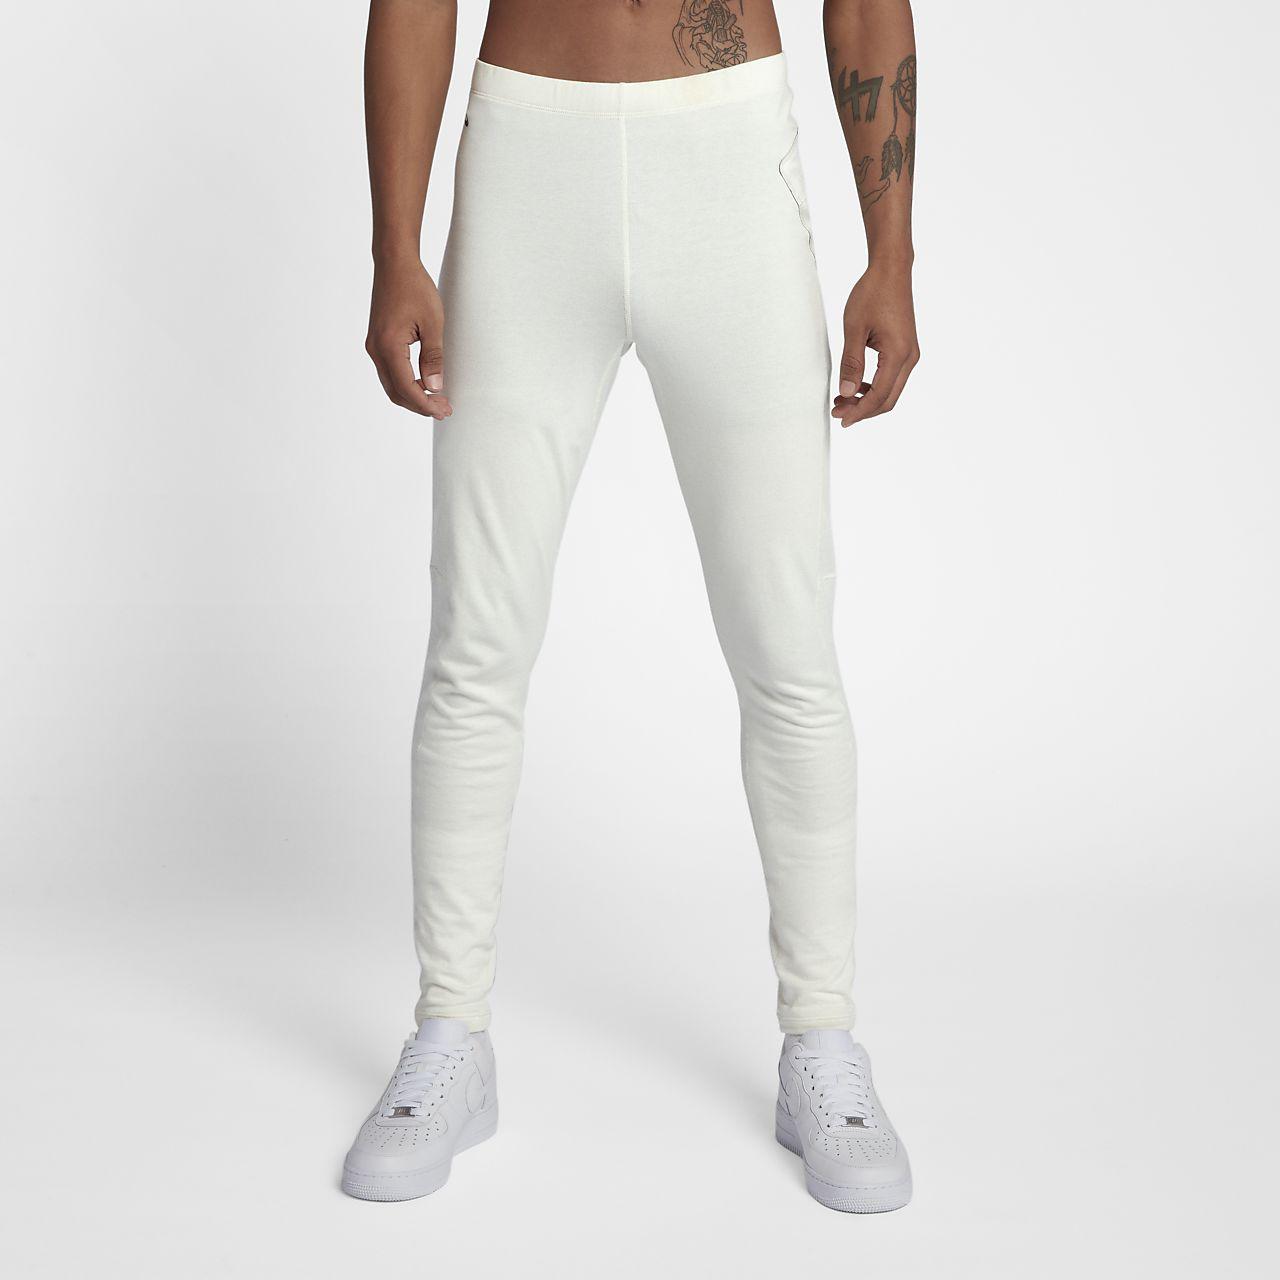 Collant NikeLab AAE 2.0 pour Homme